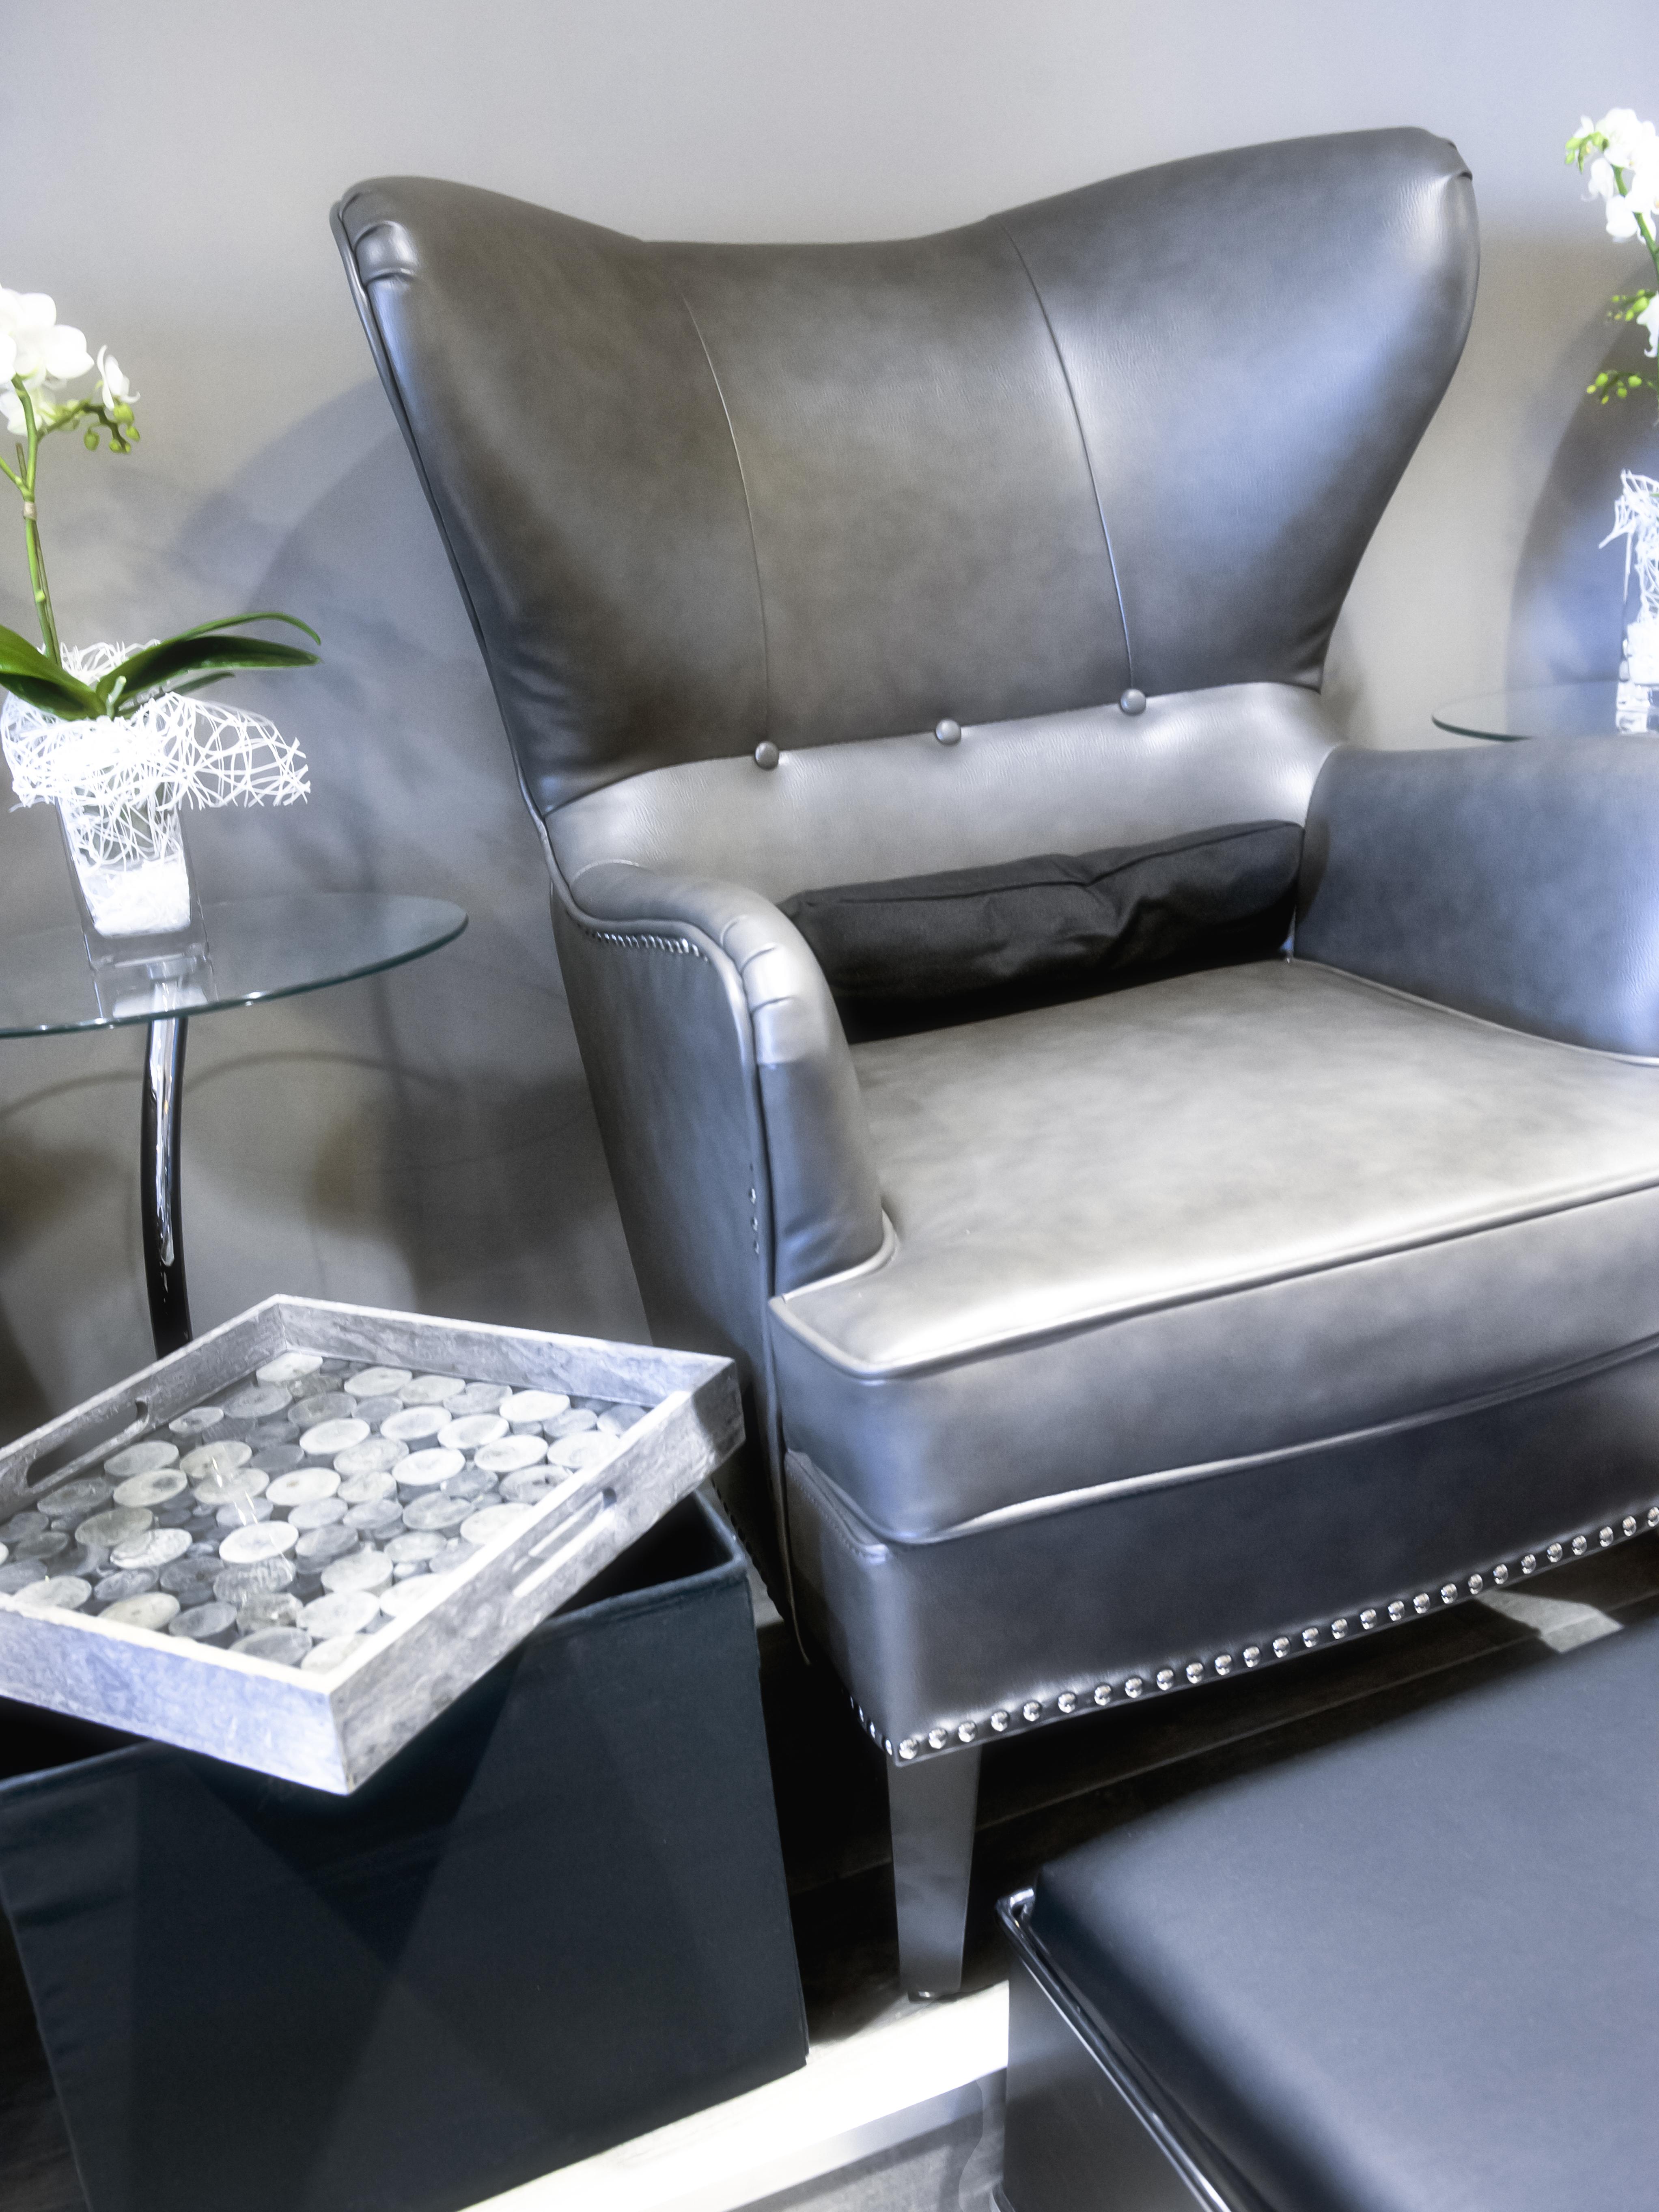 interior 02 PED chair closeup soft